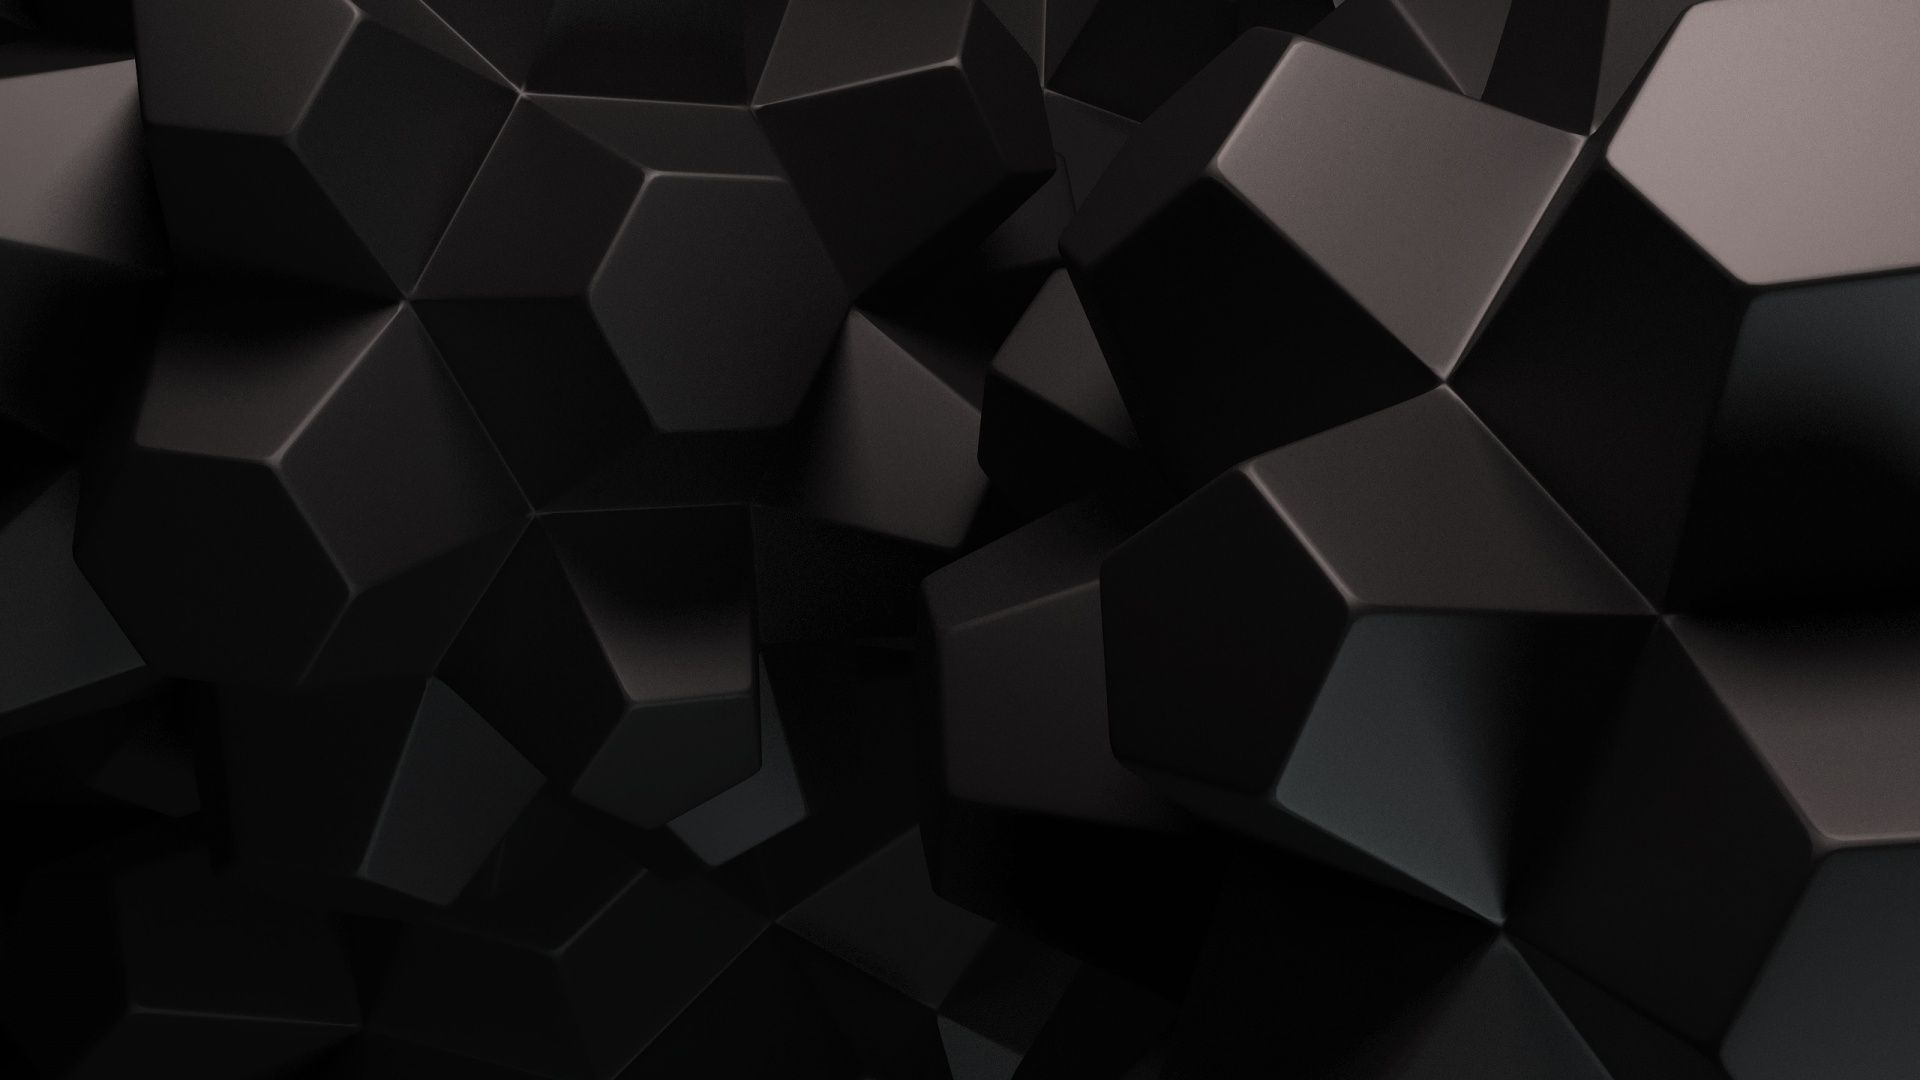 triangle wallpaper hd iphone